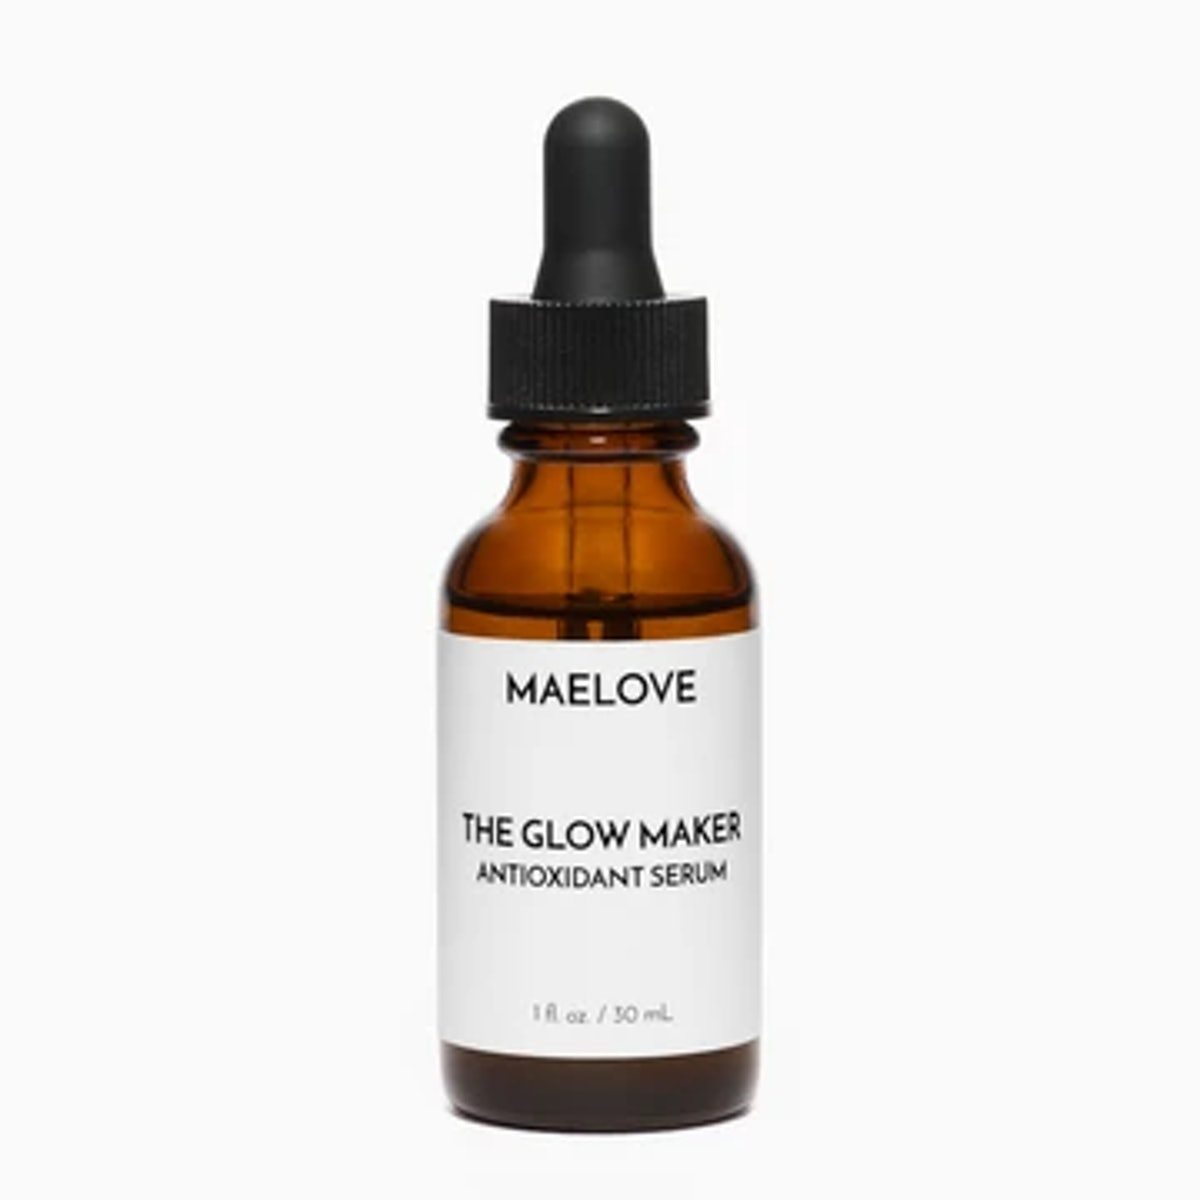 Maelove Glow Maker